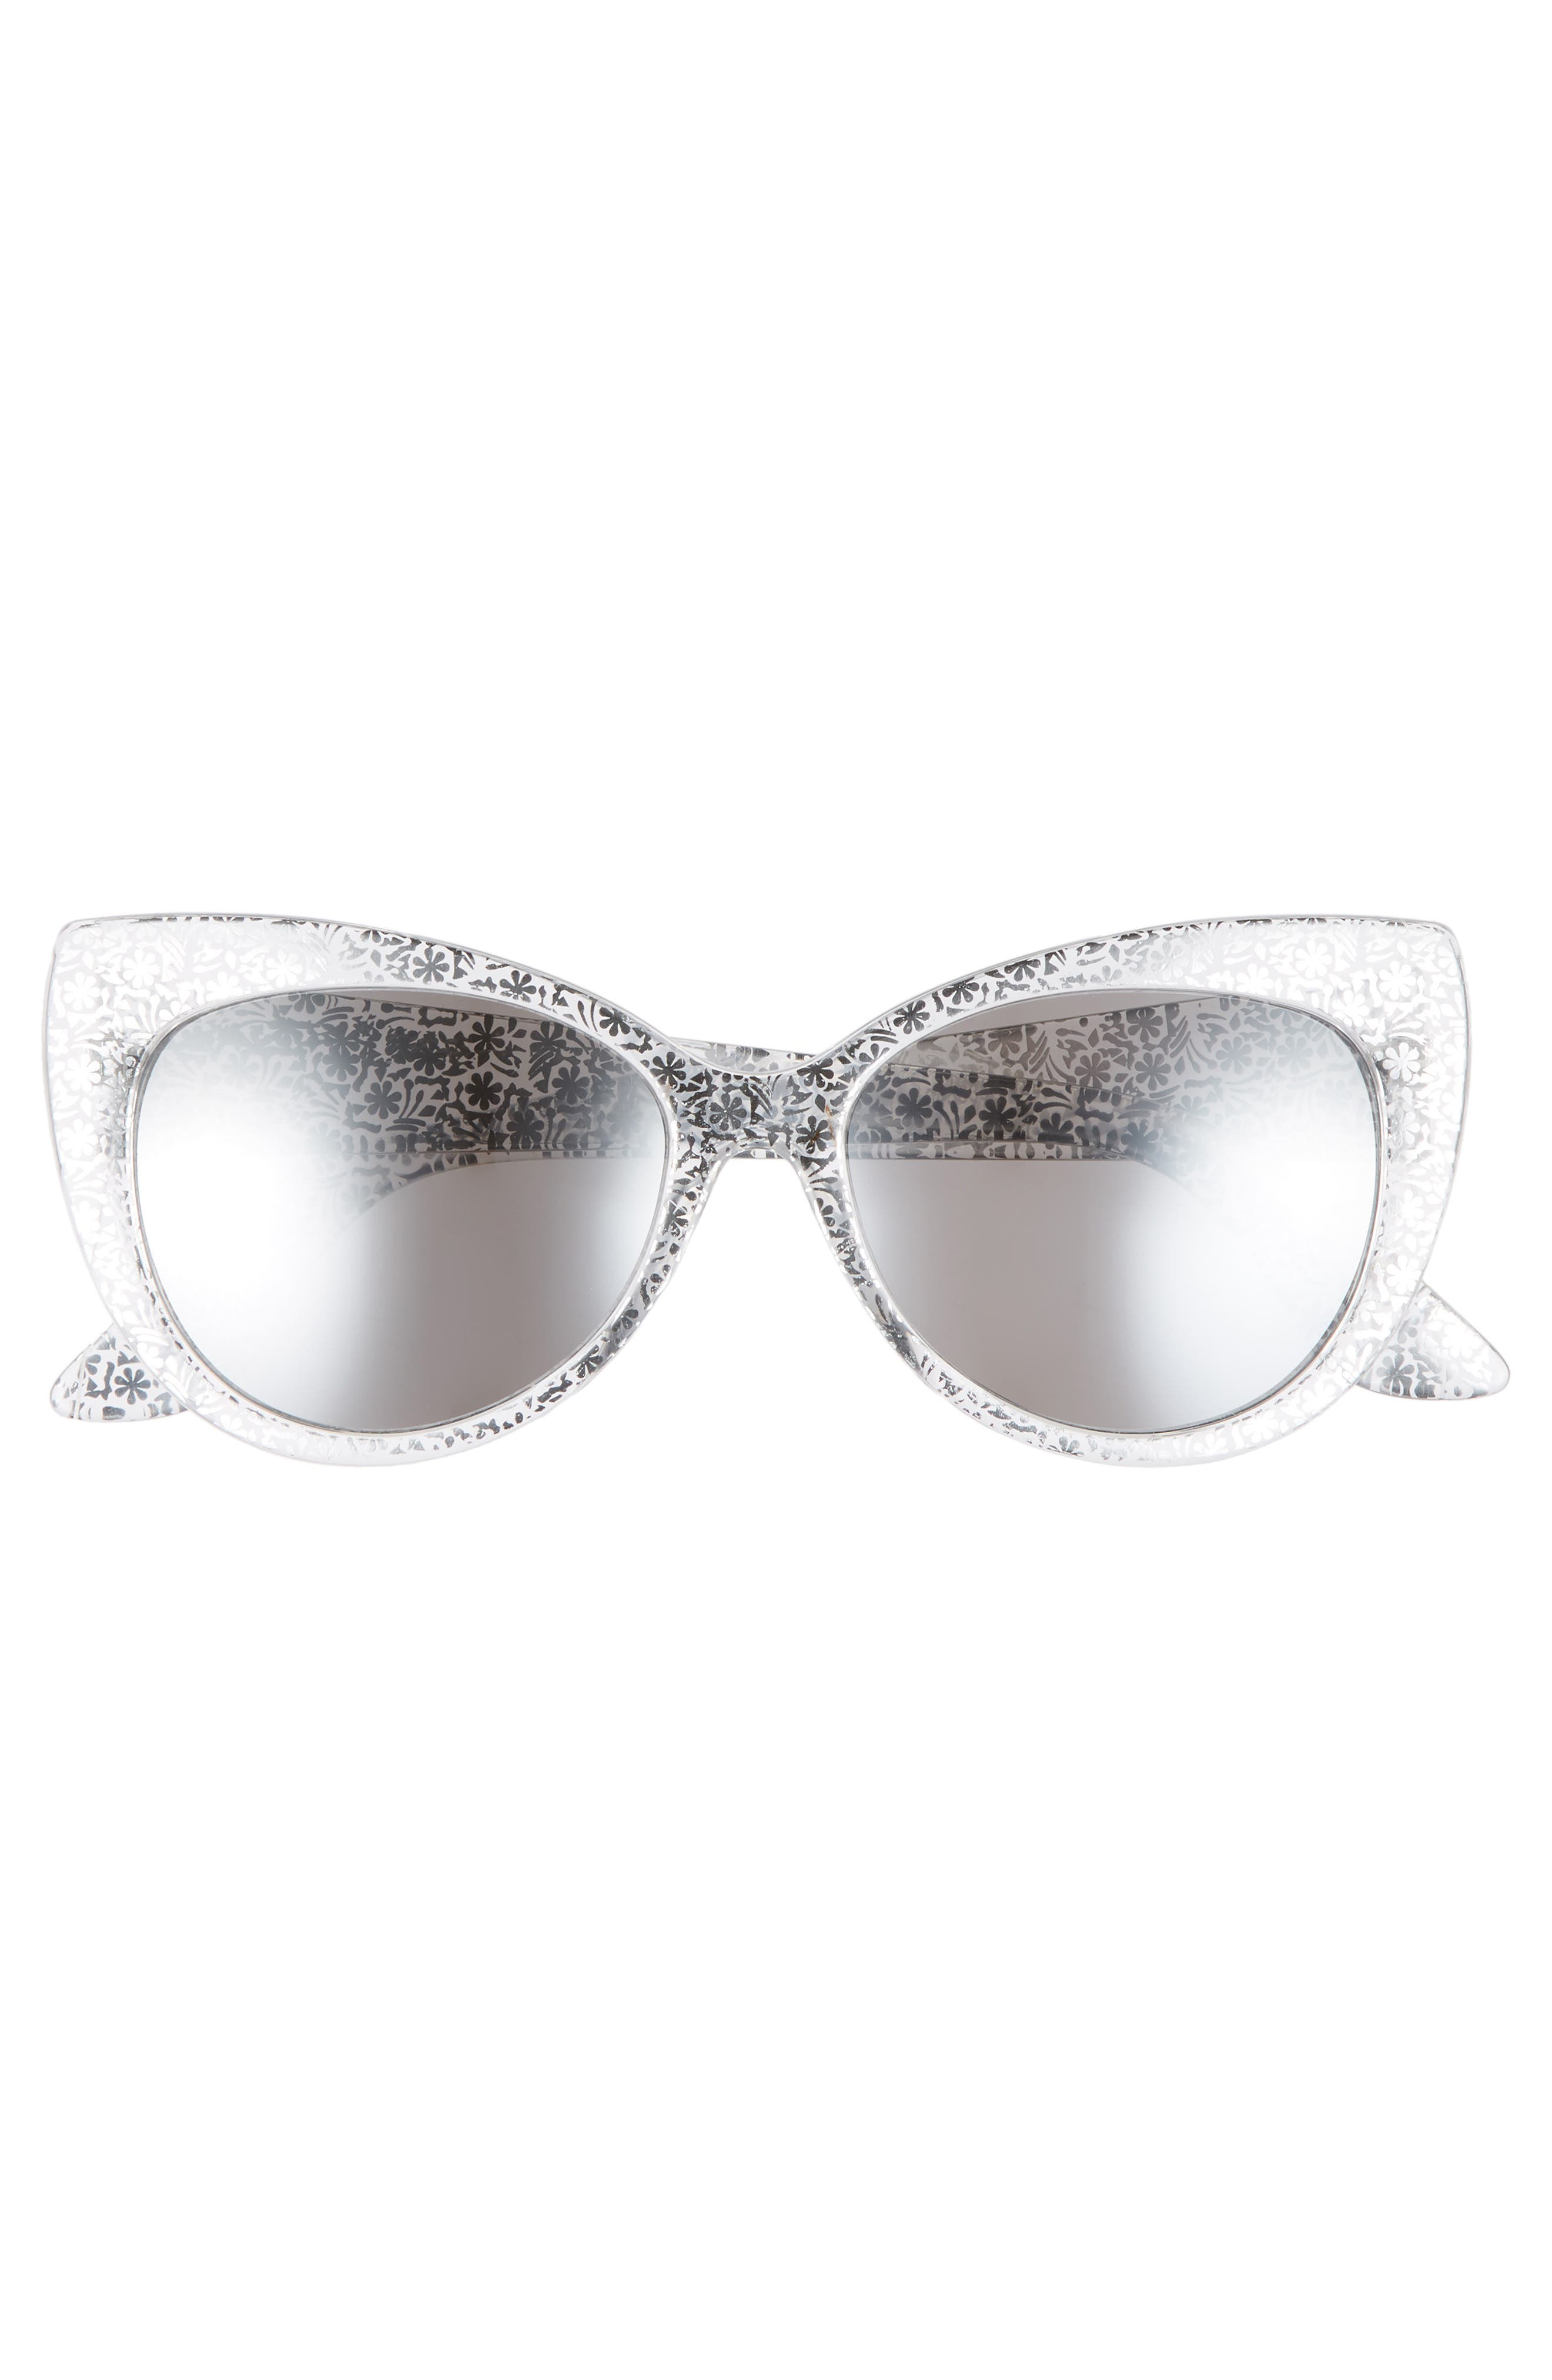 55mm Floral Cat Eye Sunglasses,                             Alternate thumbnail 5, color,